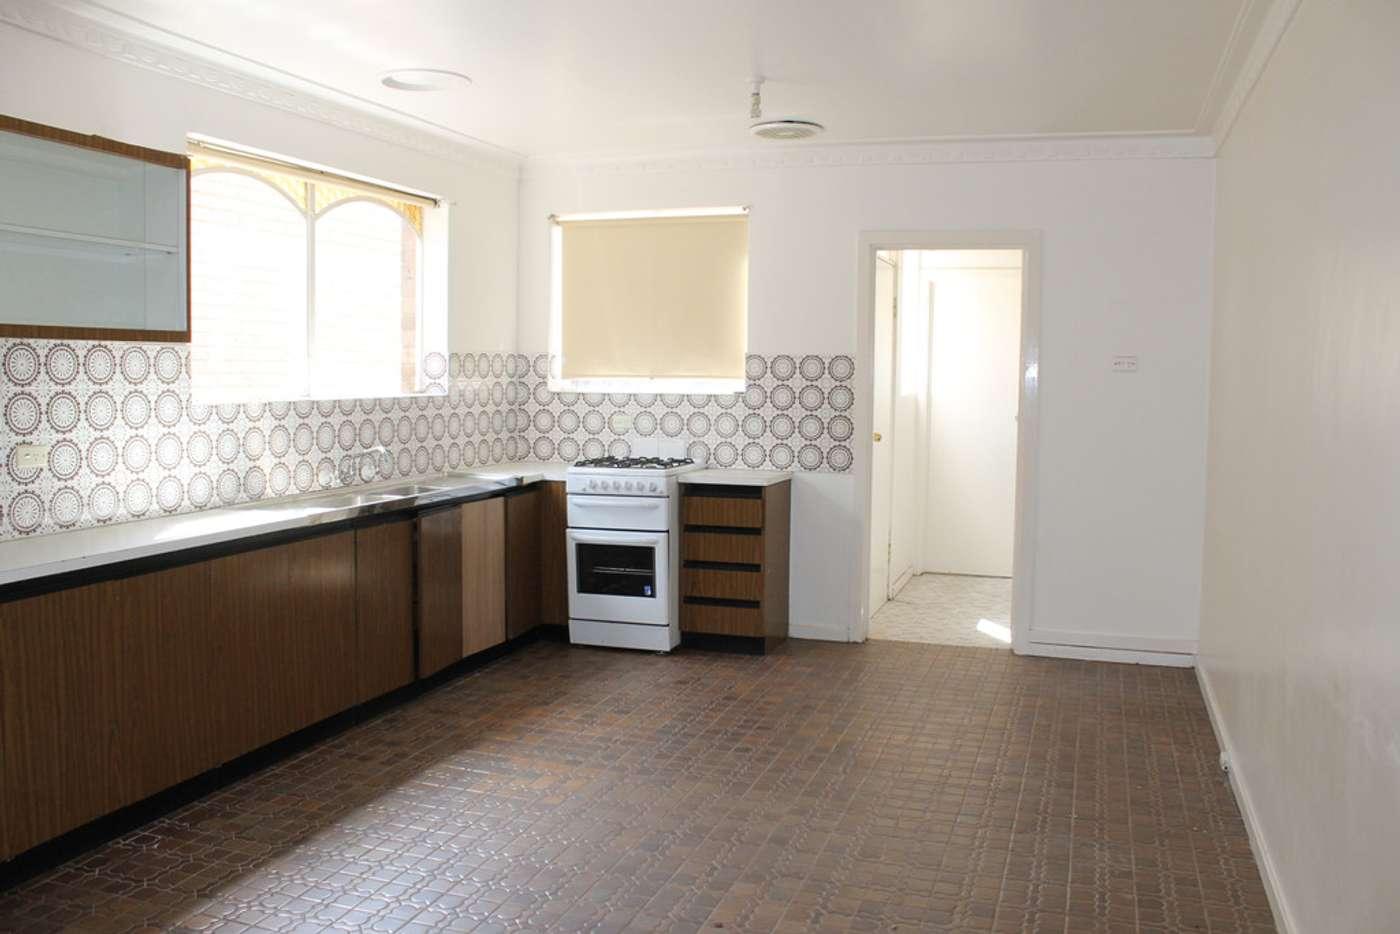 Main view of Homely unit listing, 29a The Circle, Altona North VIC 3025